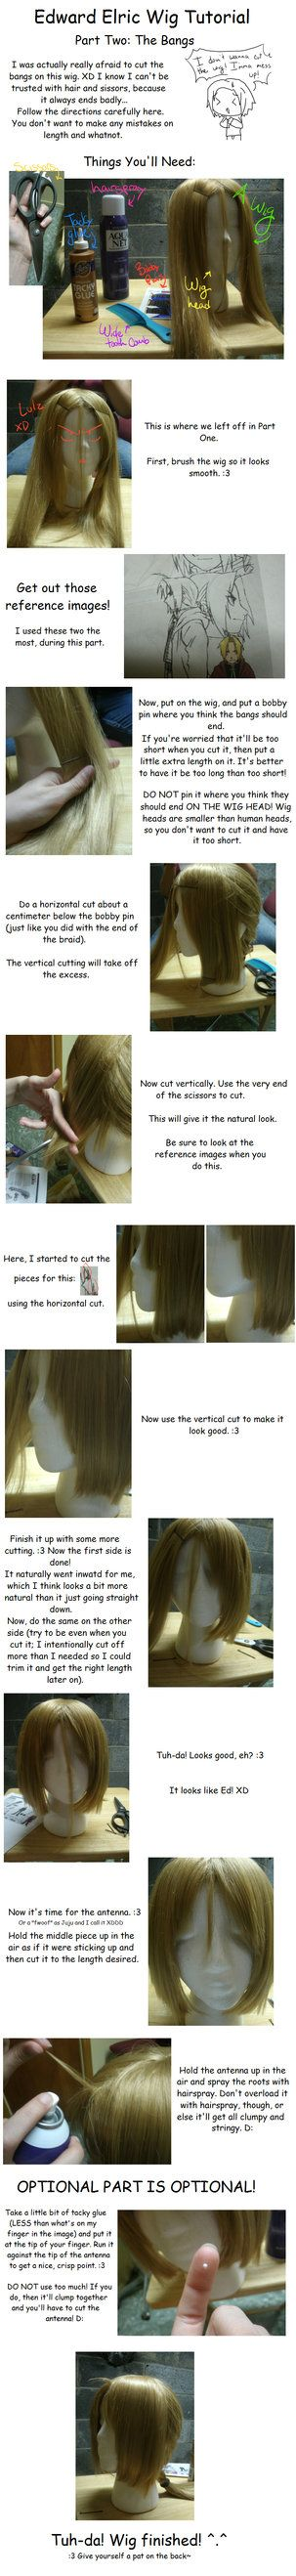 Edward Elric's wig tutorial Part 2 by SakiRee #Fullmetal Alchemist